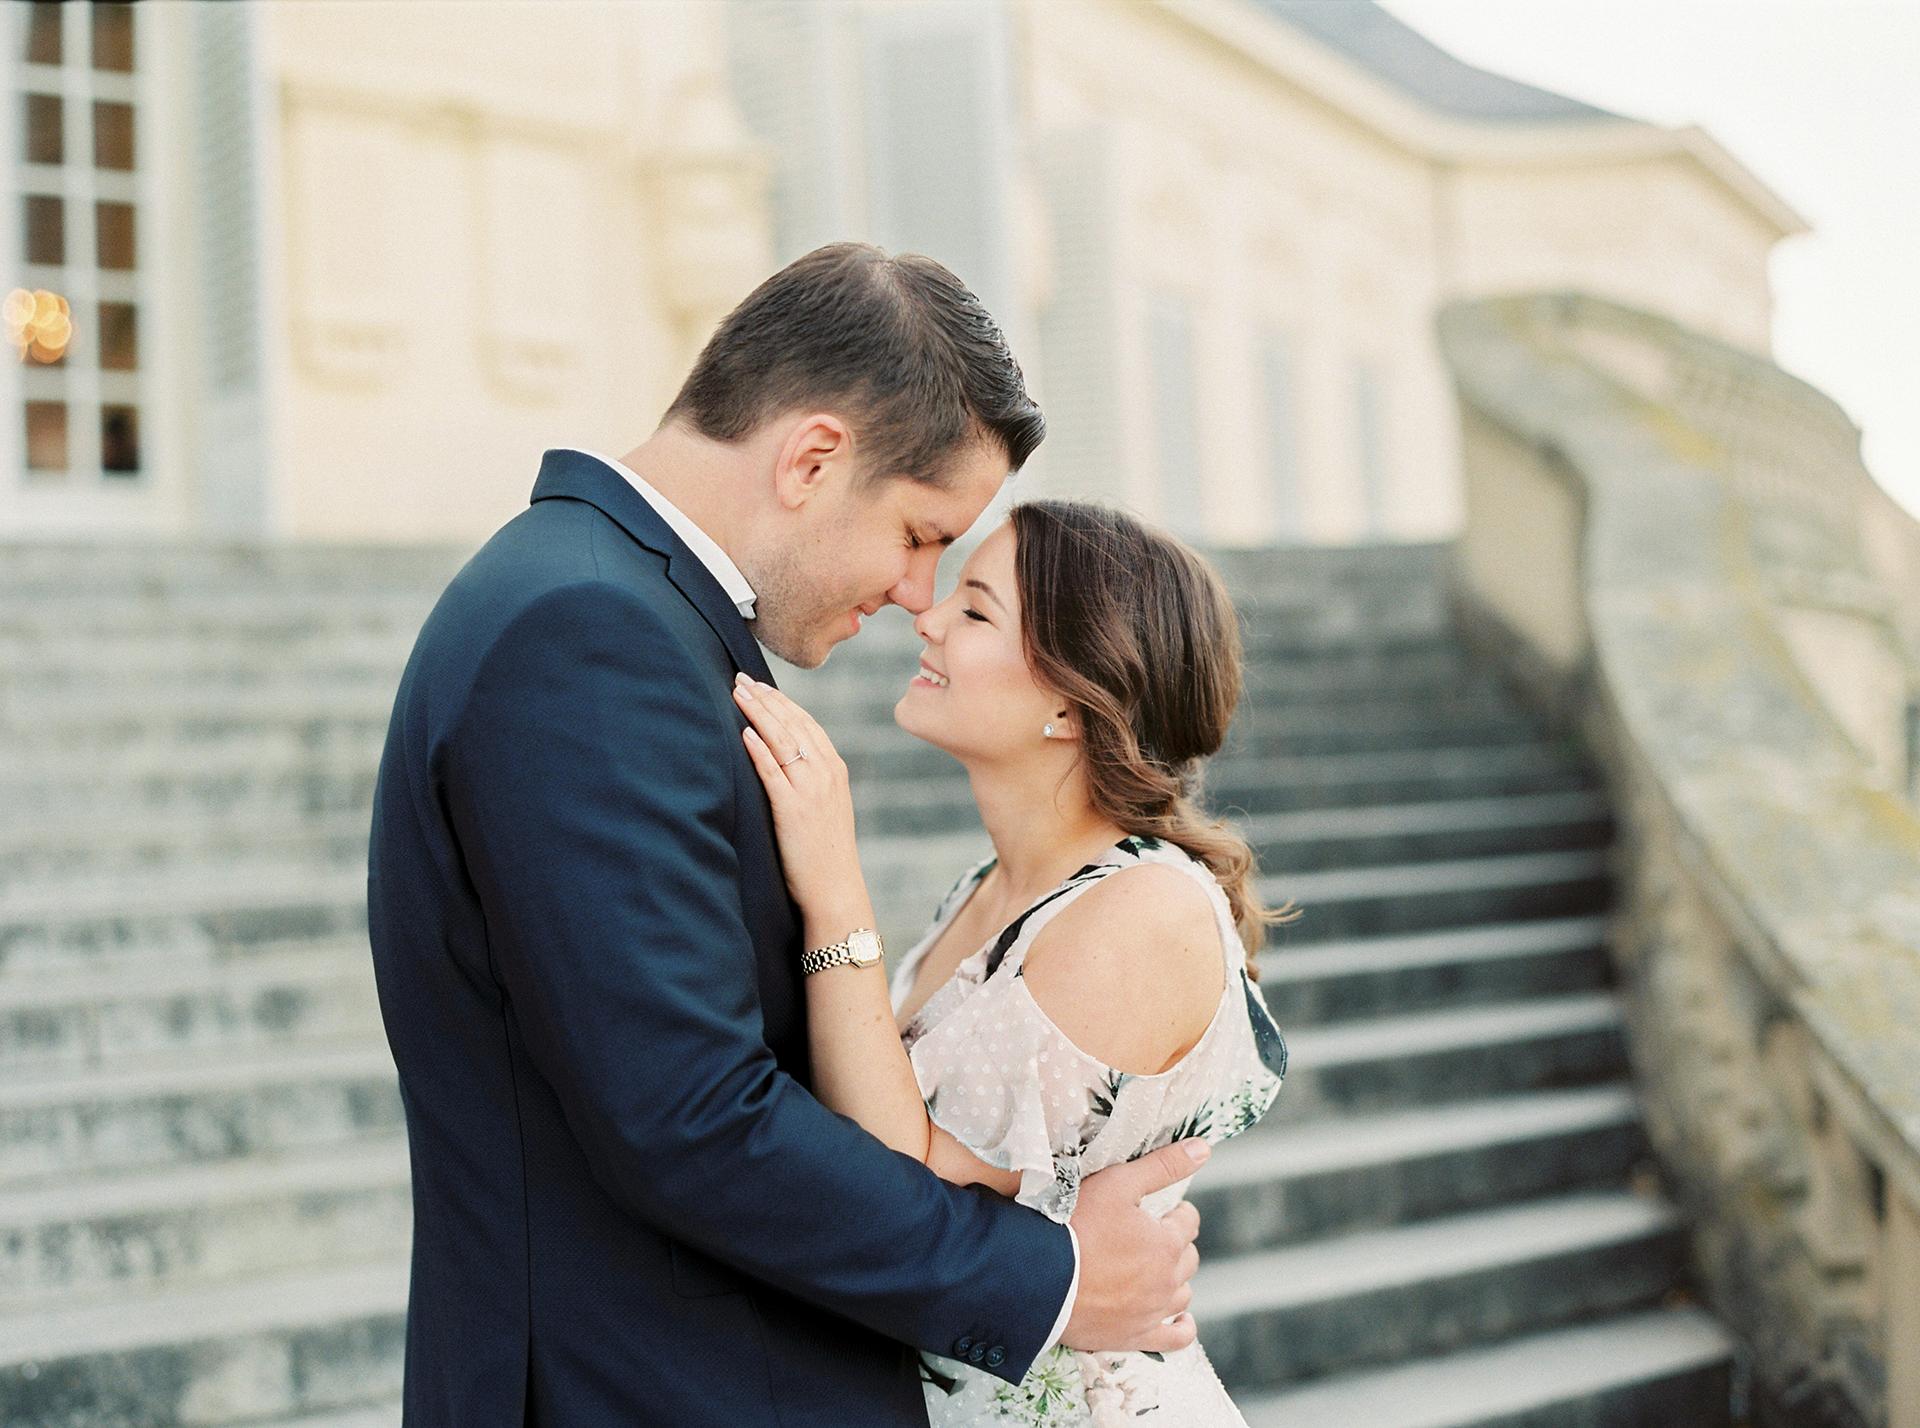 RominaSchischkeFotografie-Selina&DennisBüssing-Engagement-Bild-46